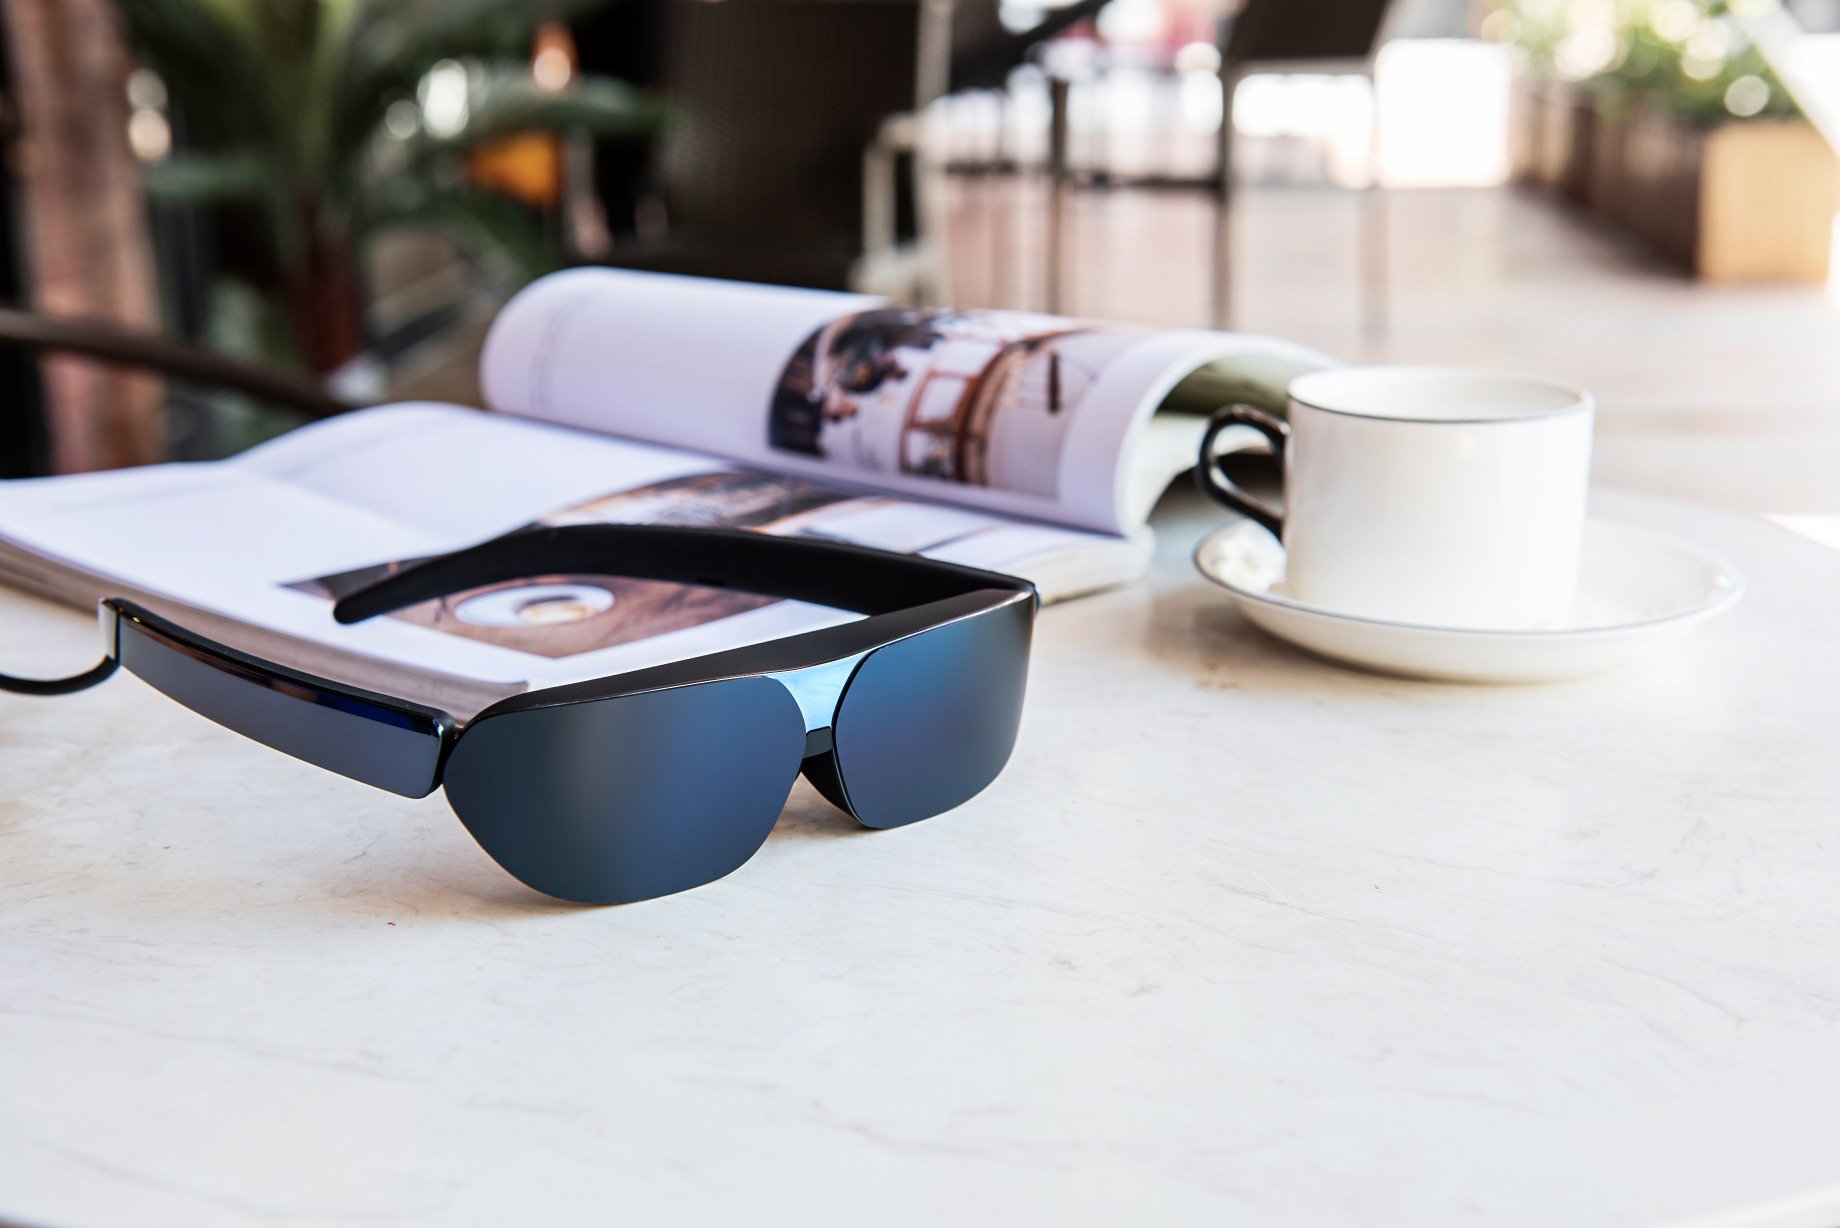 TCL智能眼镜NxtWear G将于7月首先在澳大利亚开始销售